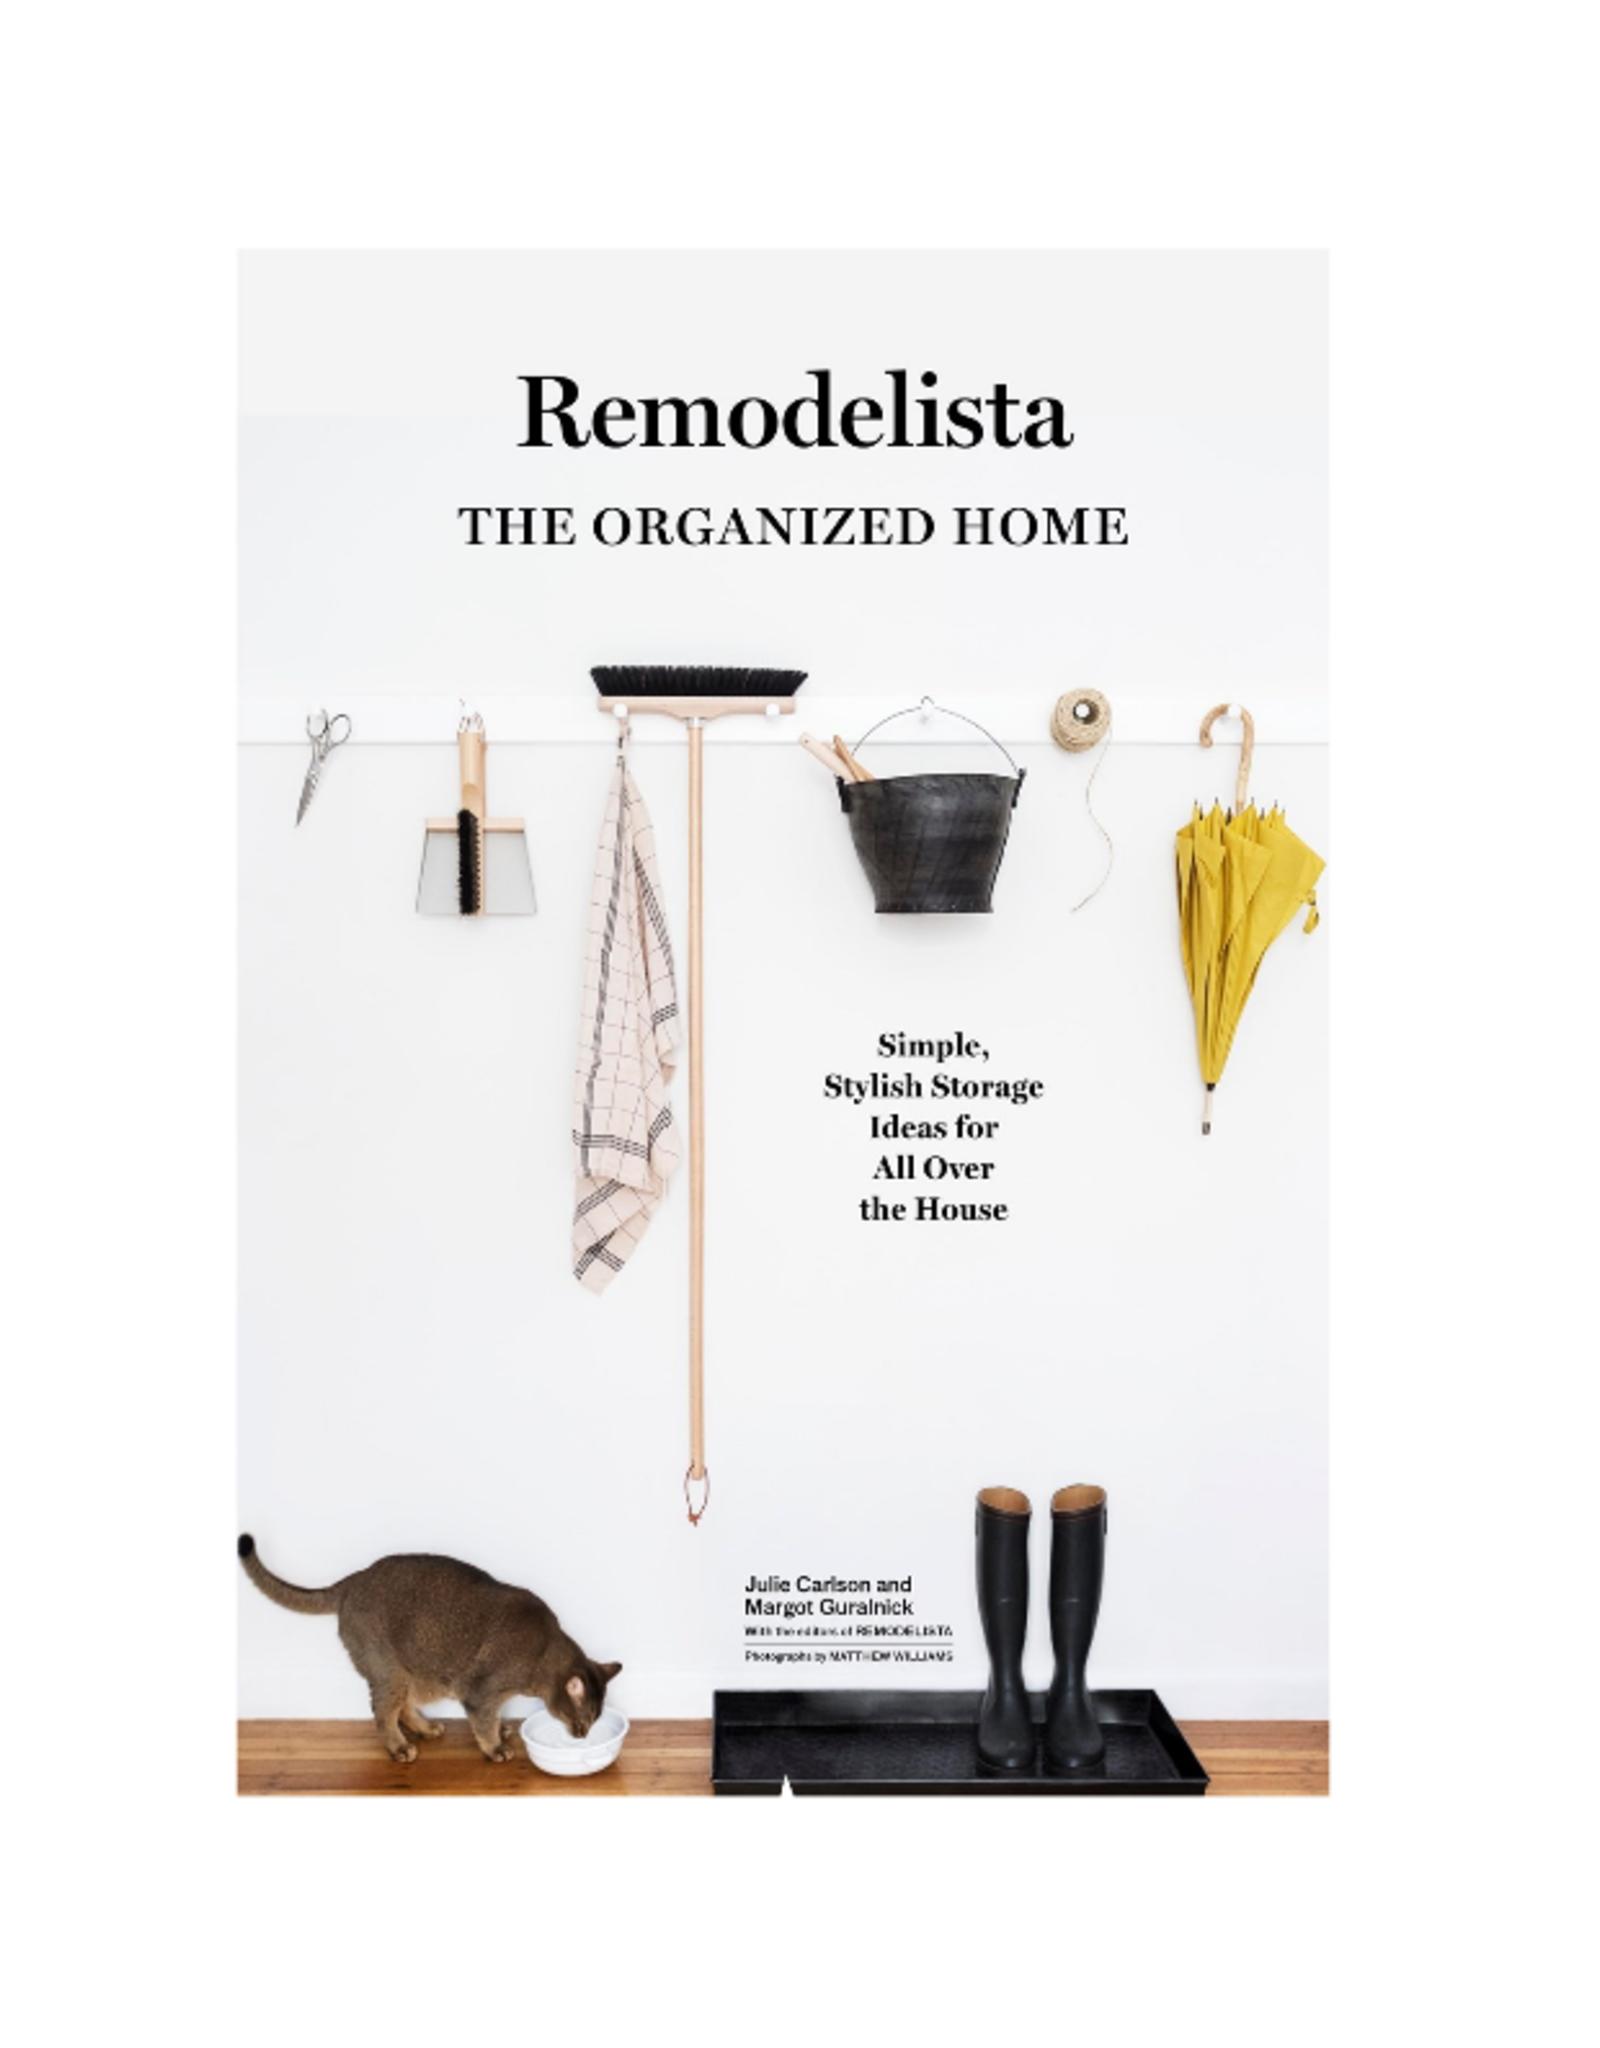 REMODELISTA ORGANIZED HOME